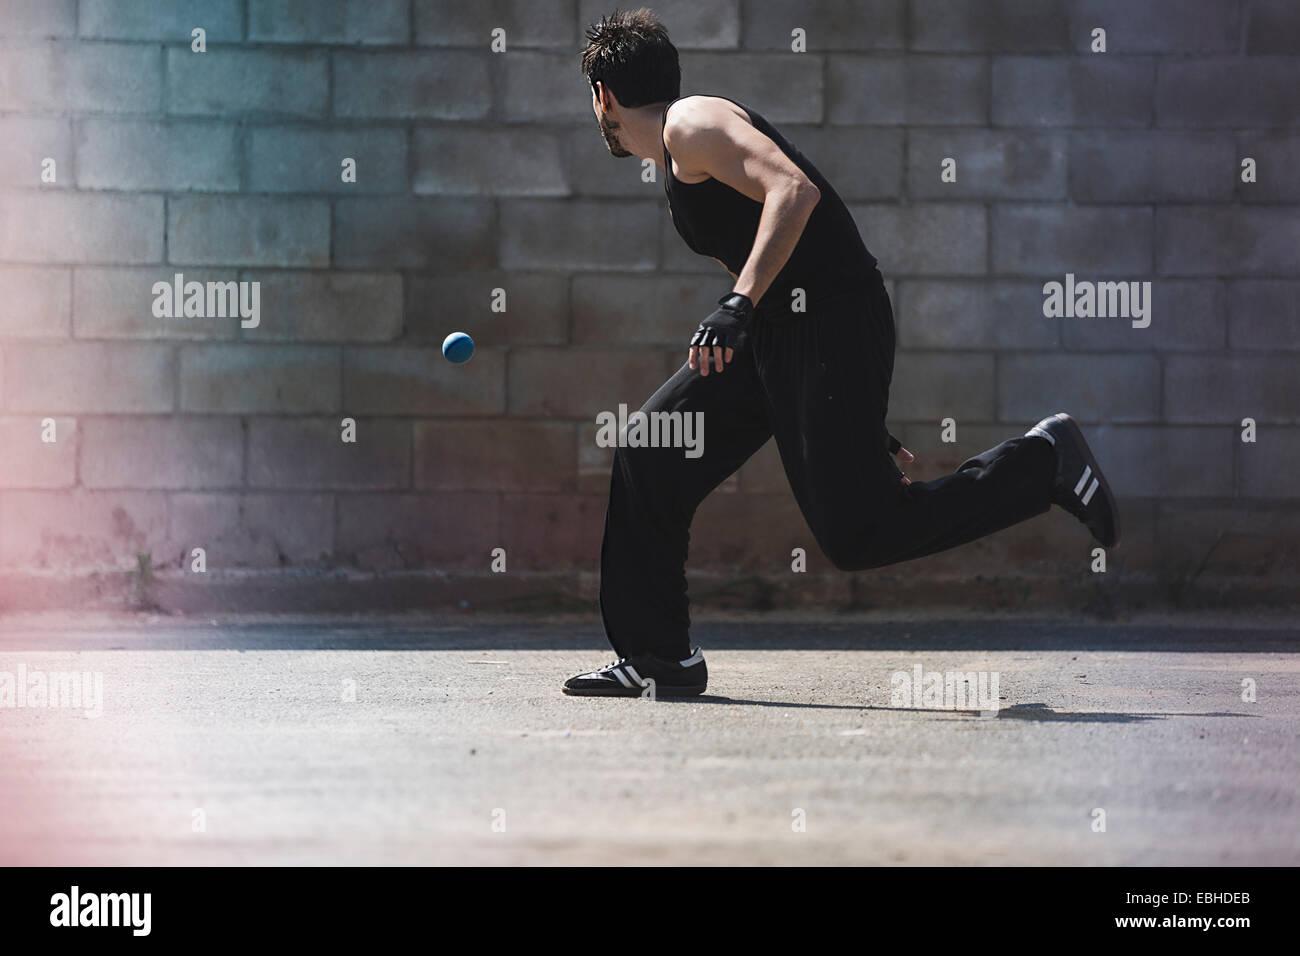 Joven jugador de balonmano masculino ejecutando para pelota Imagen De Stock